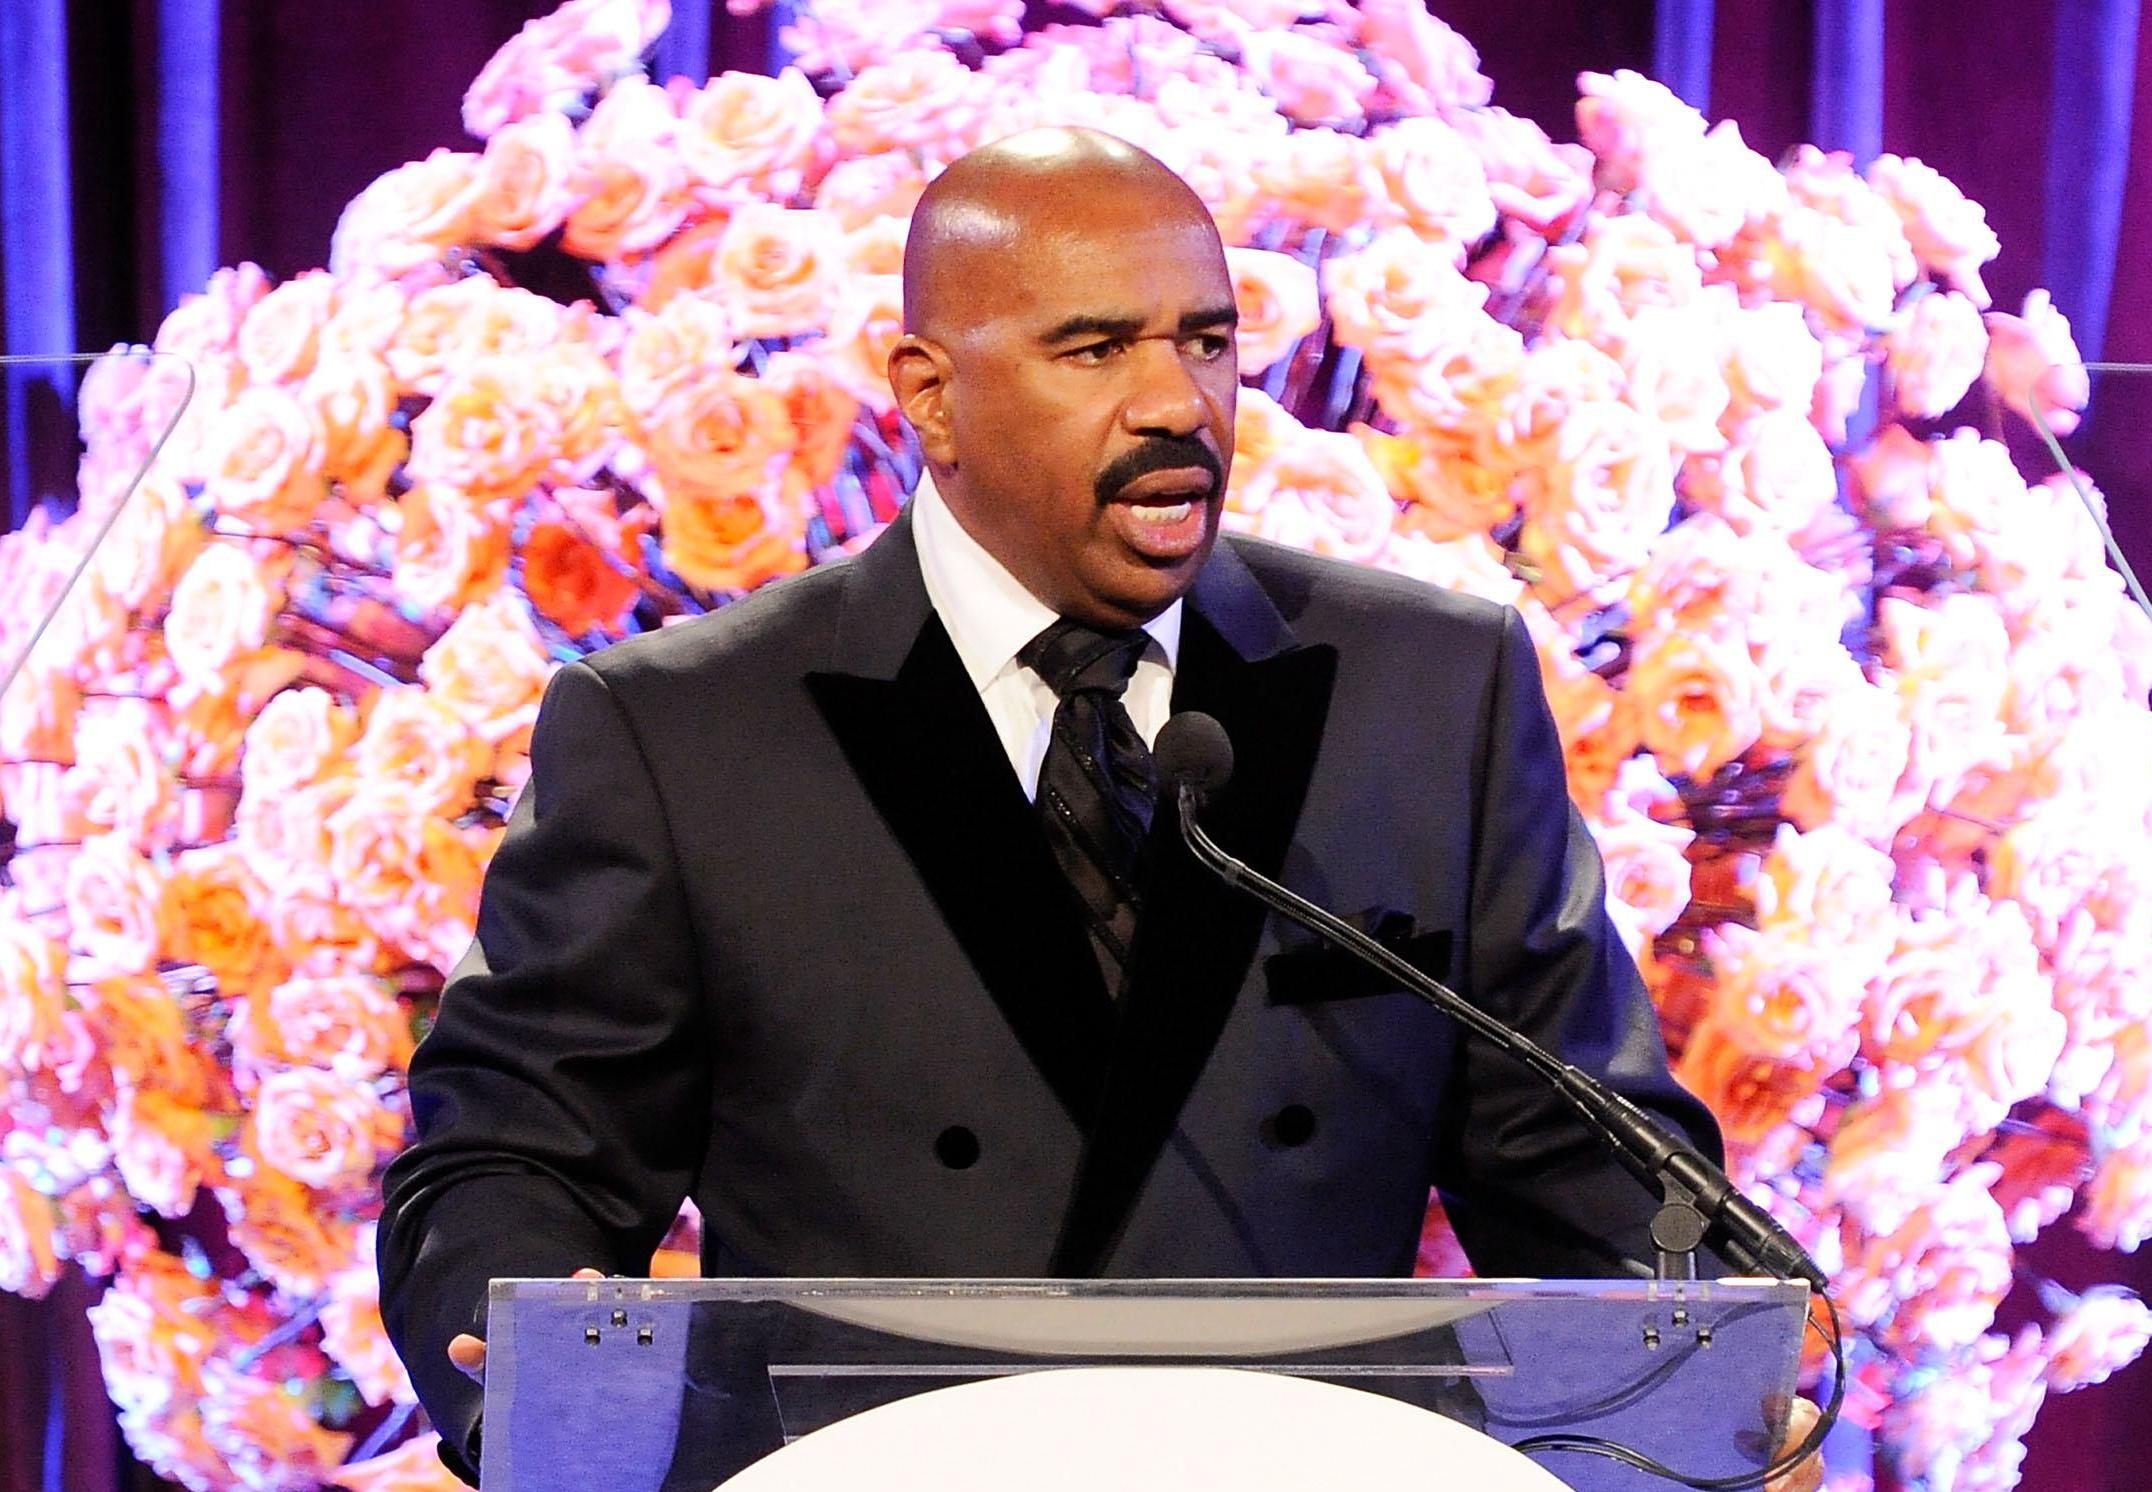 Steve Harvey Hosts 2nd Annual Steve Harvey Foundation Gala In New York - Inside